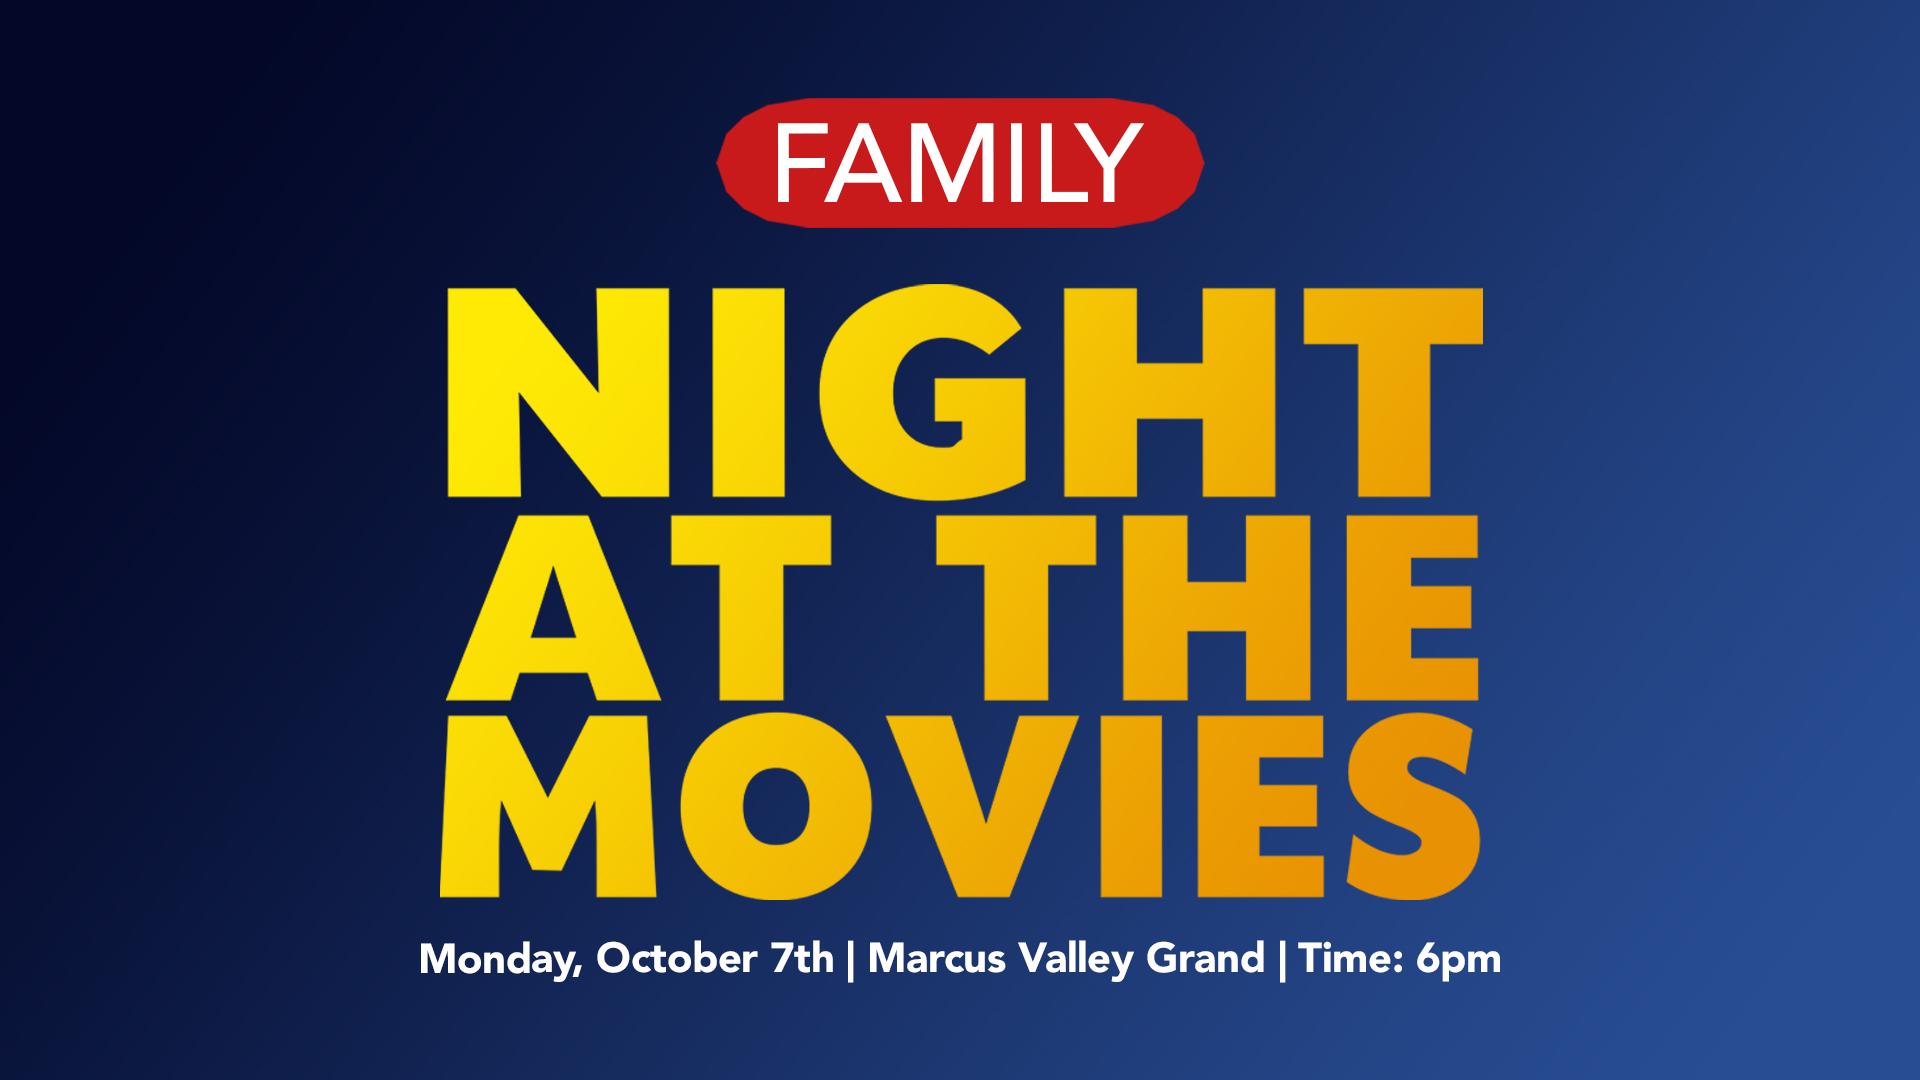 Family Night at the Movies.jpg